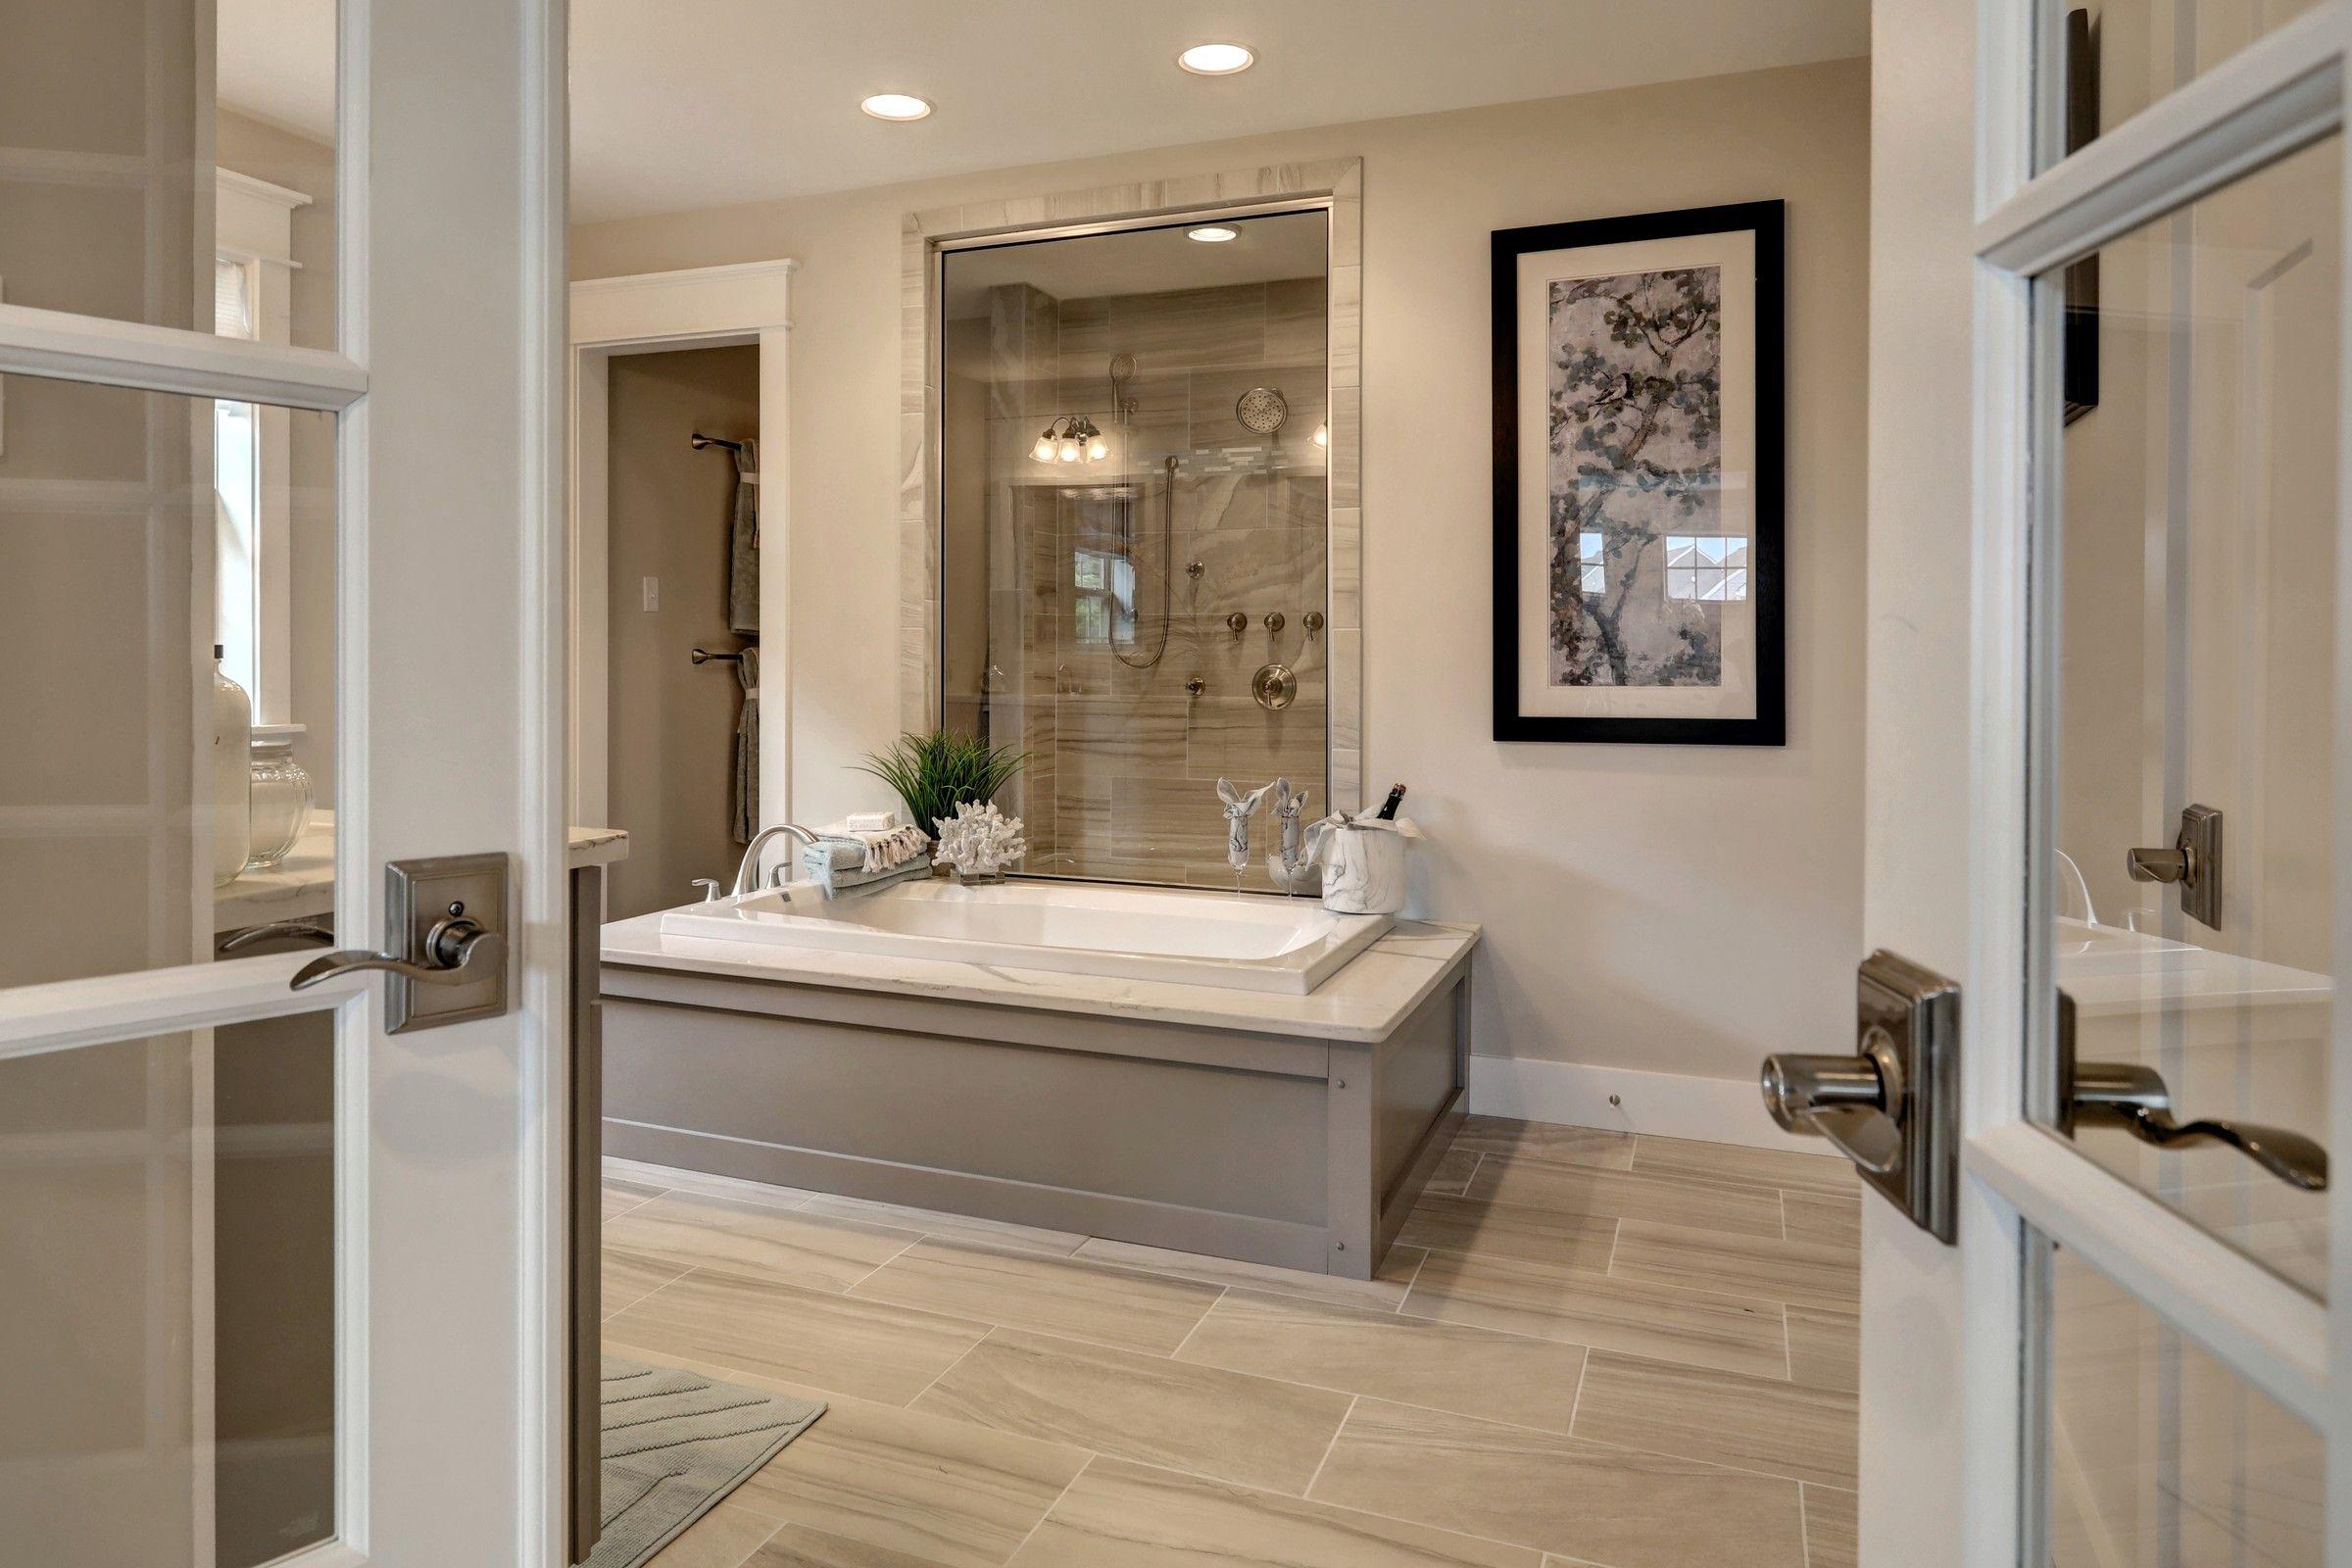 Bathroom featured in the Covington Heritage By Keystone Custom Homes in Philadelphia, PA